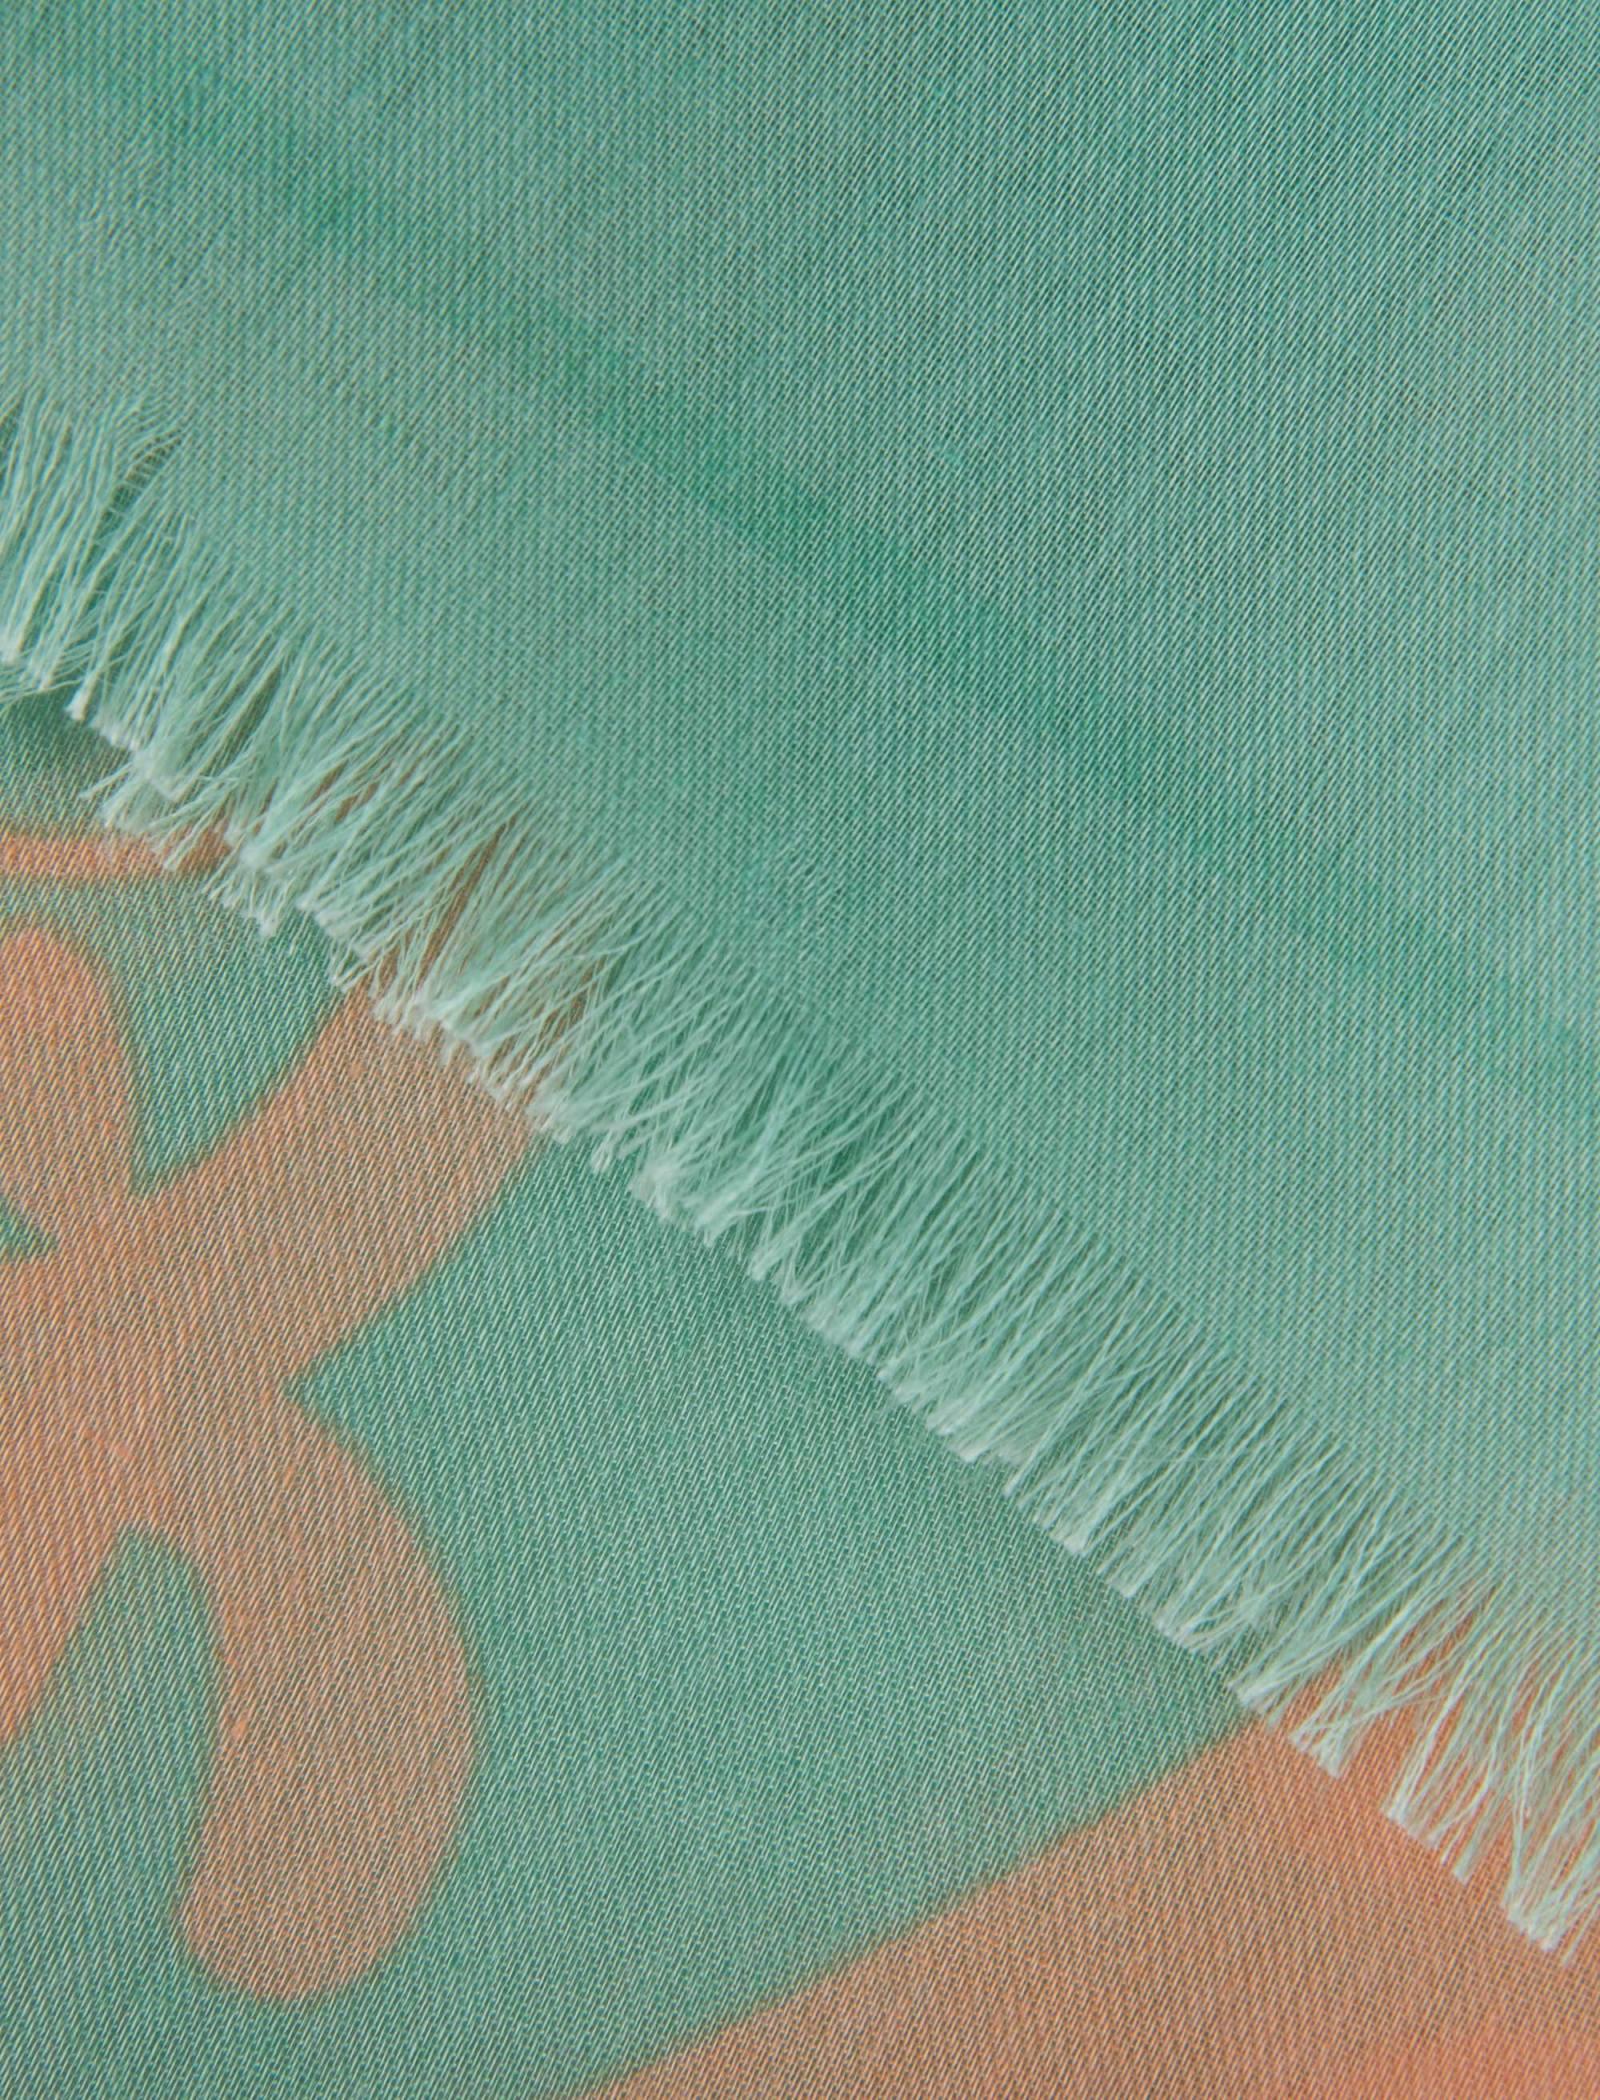 شال نخی زنانه - رزتی - گلبهي و سبز روشن - 2